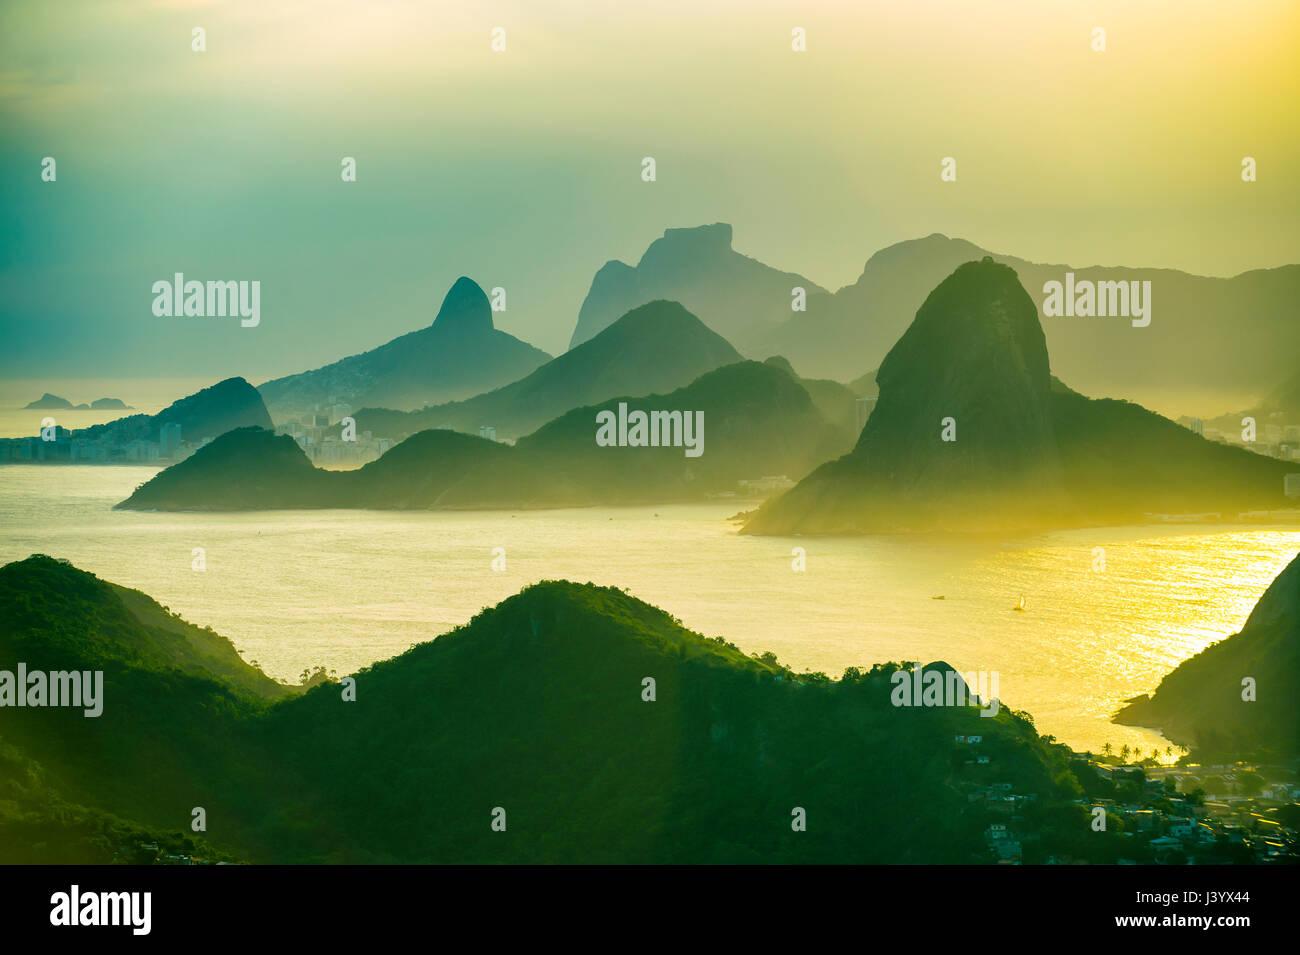 Golden sunset vista panorámica del paisaje montañoso de Rio de Janeiro, Brasil, con la bahía de Guanabara Imagen De Stock